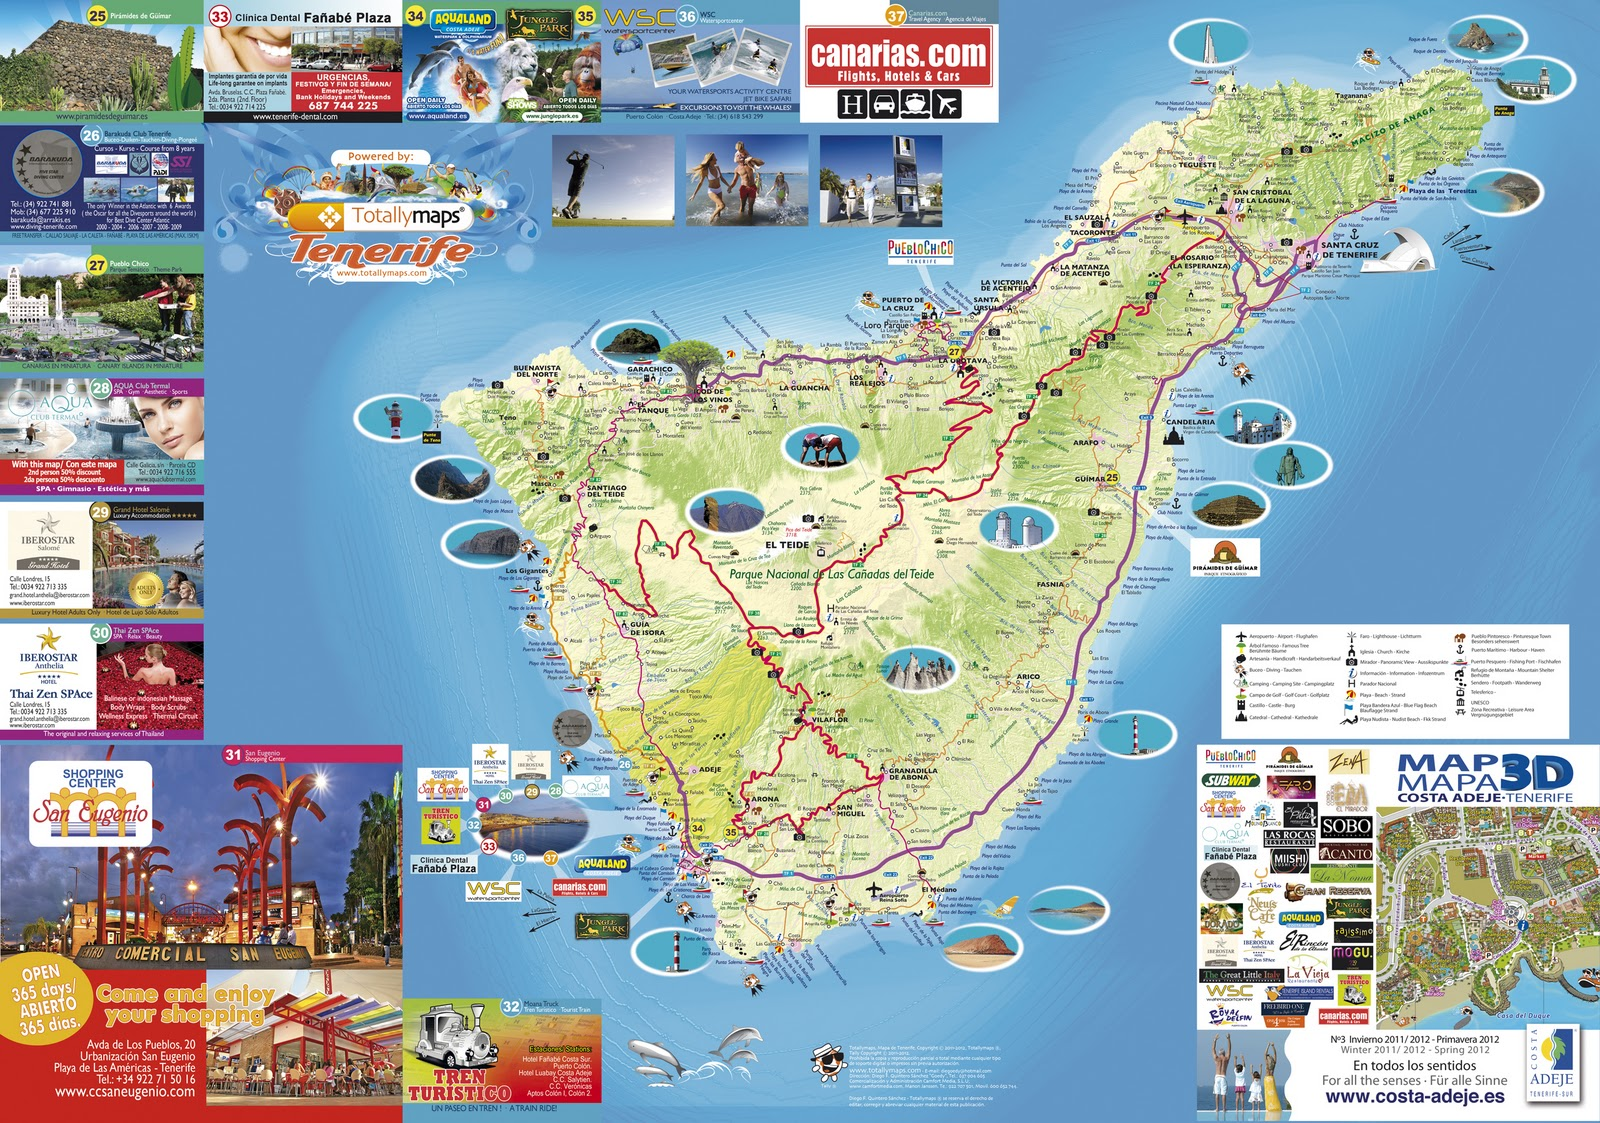 carte touristique de Tenerife